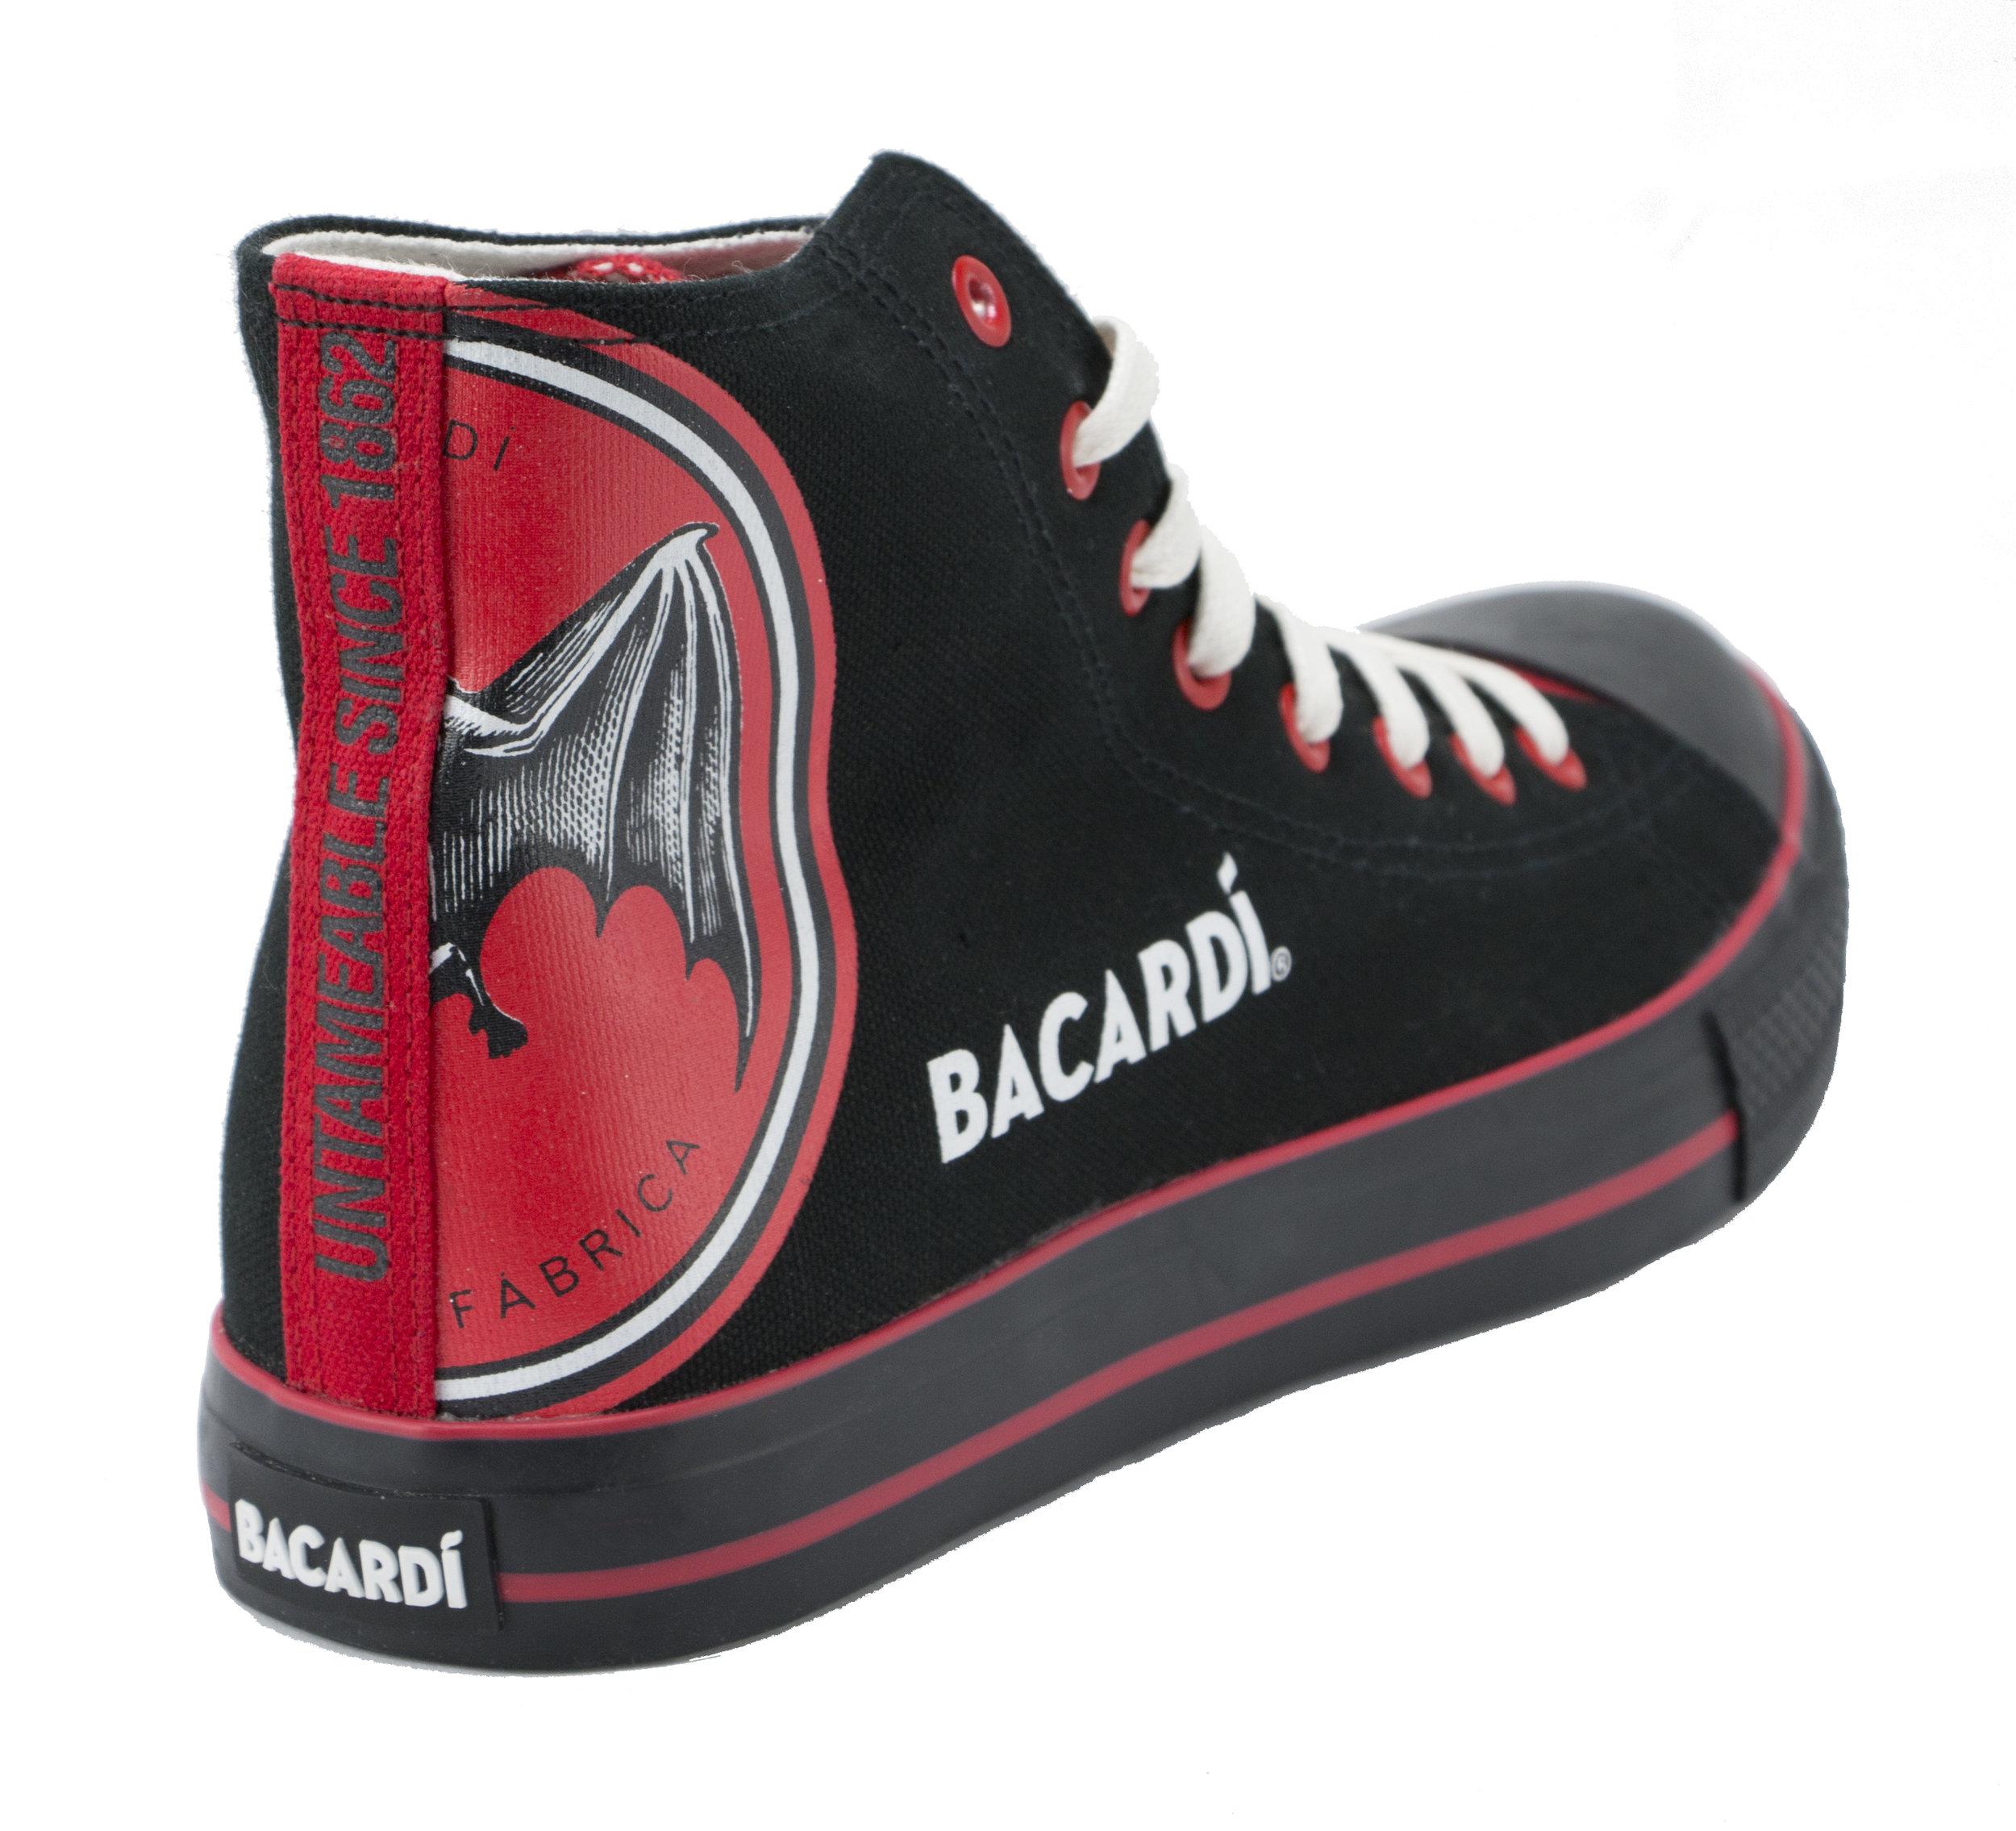 Bacardi High Top Back.jpg